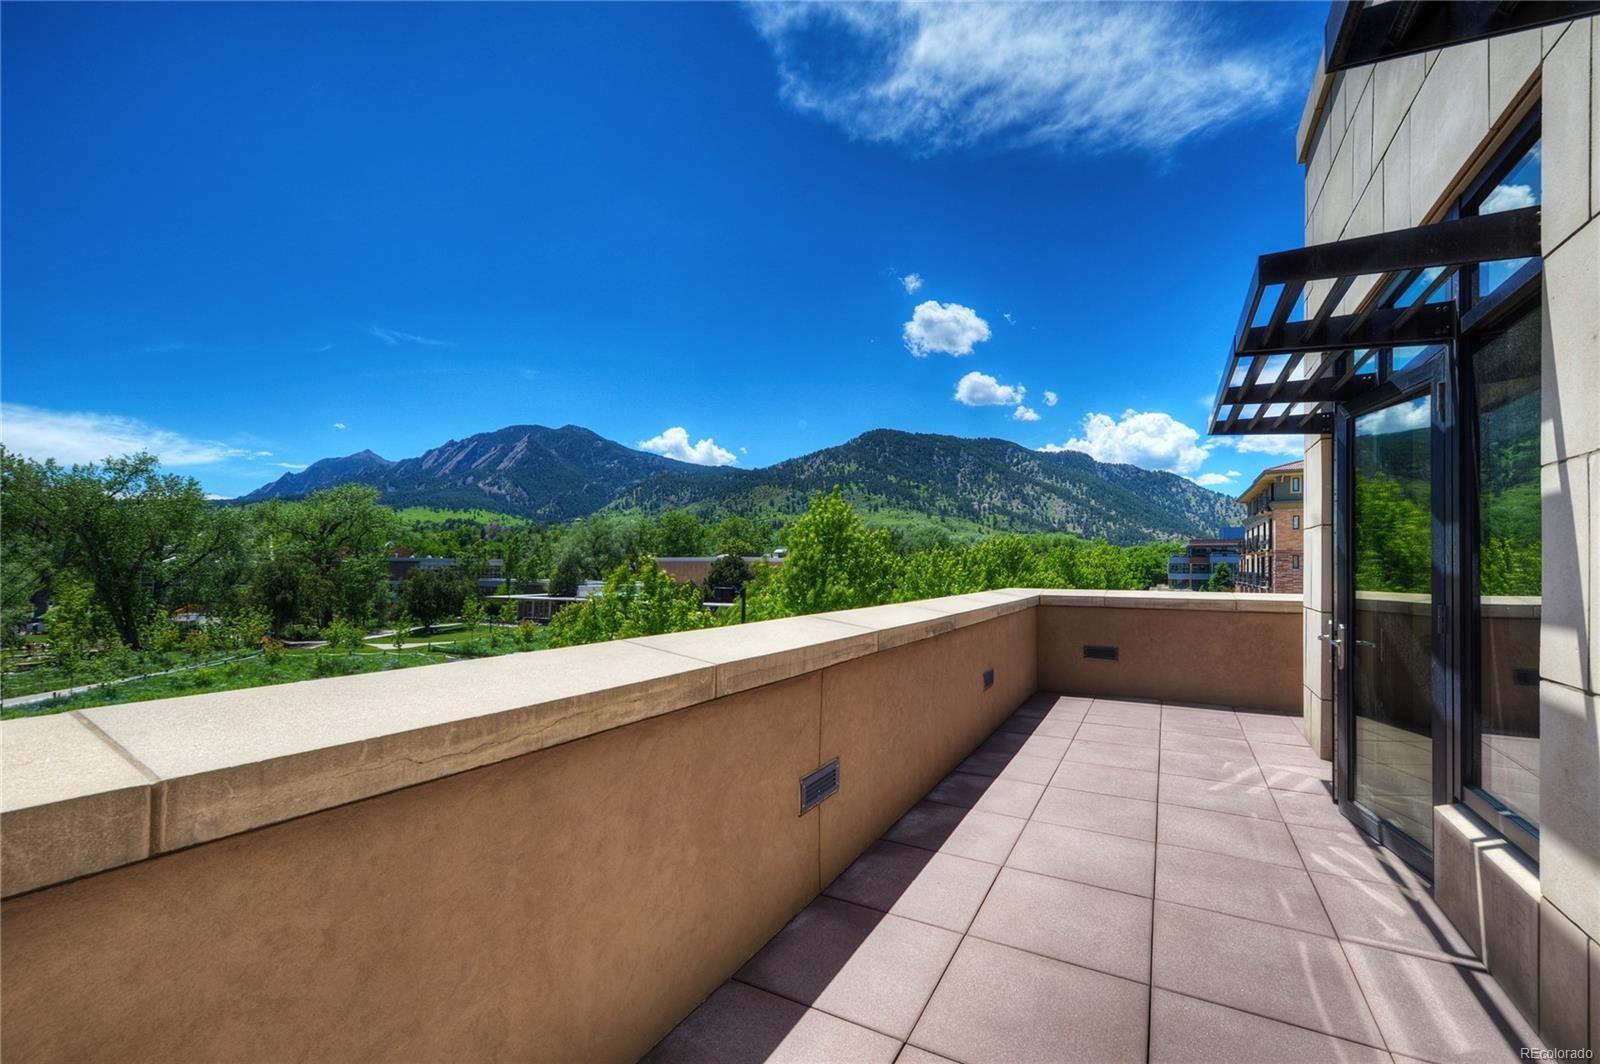 MLS# 8081755 - 4 - 1077 Canyon Boulevard #302, Boulder, CO 80302